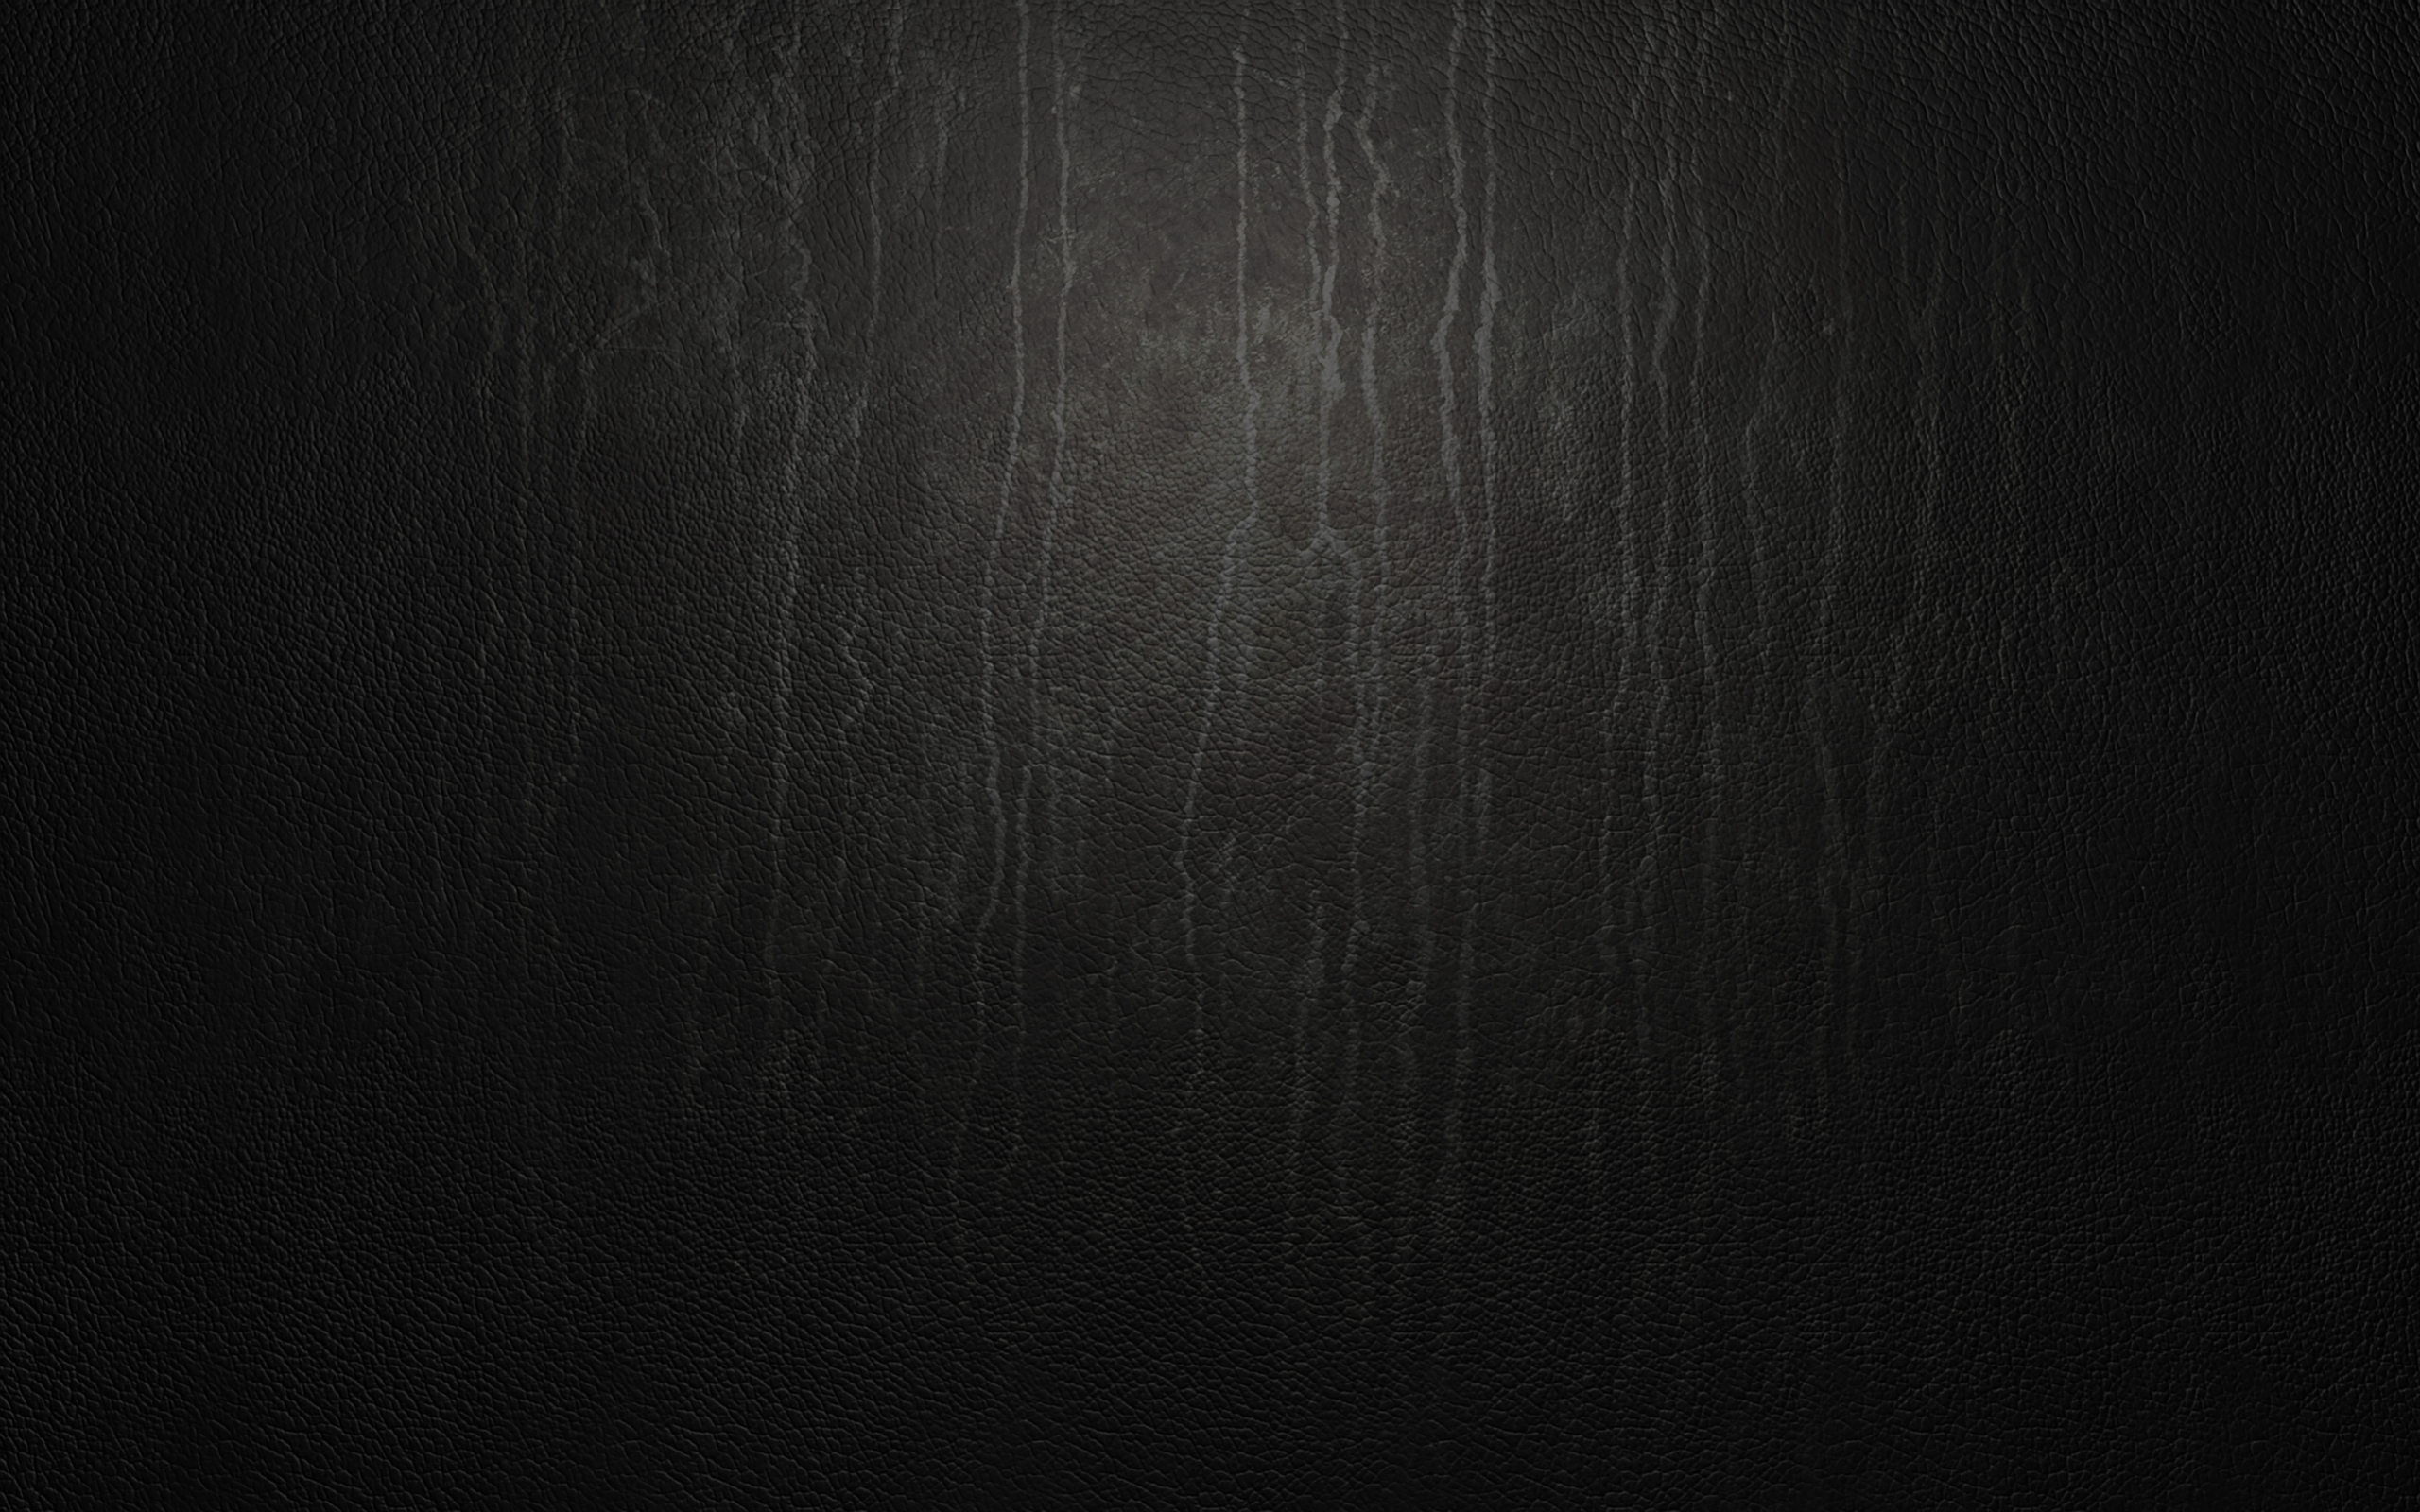 Textura de fino cuero - 2560x1600